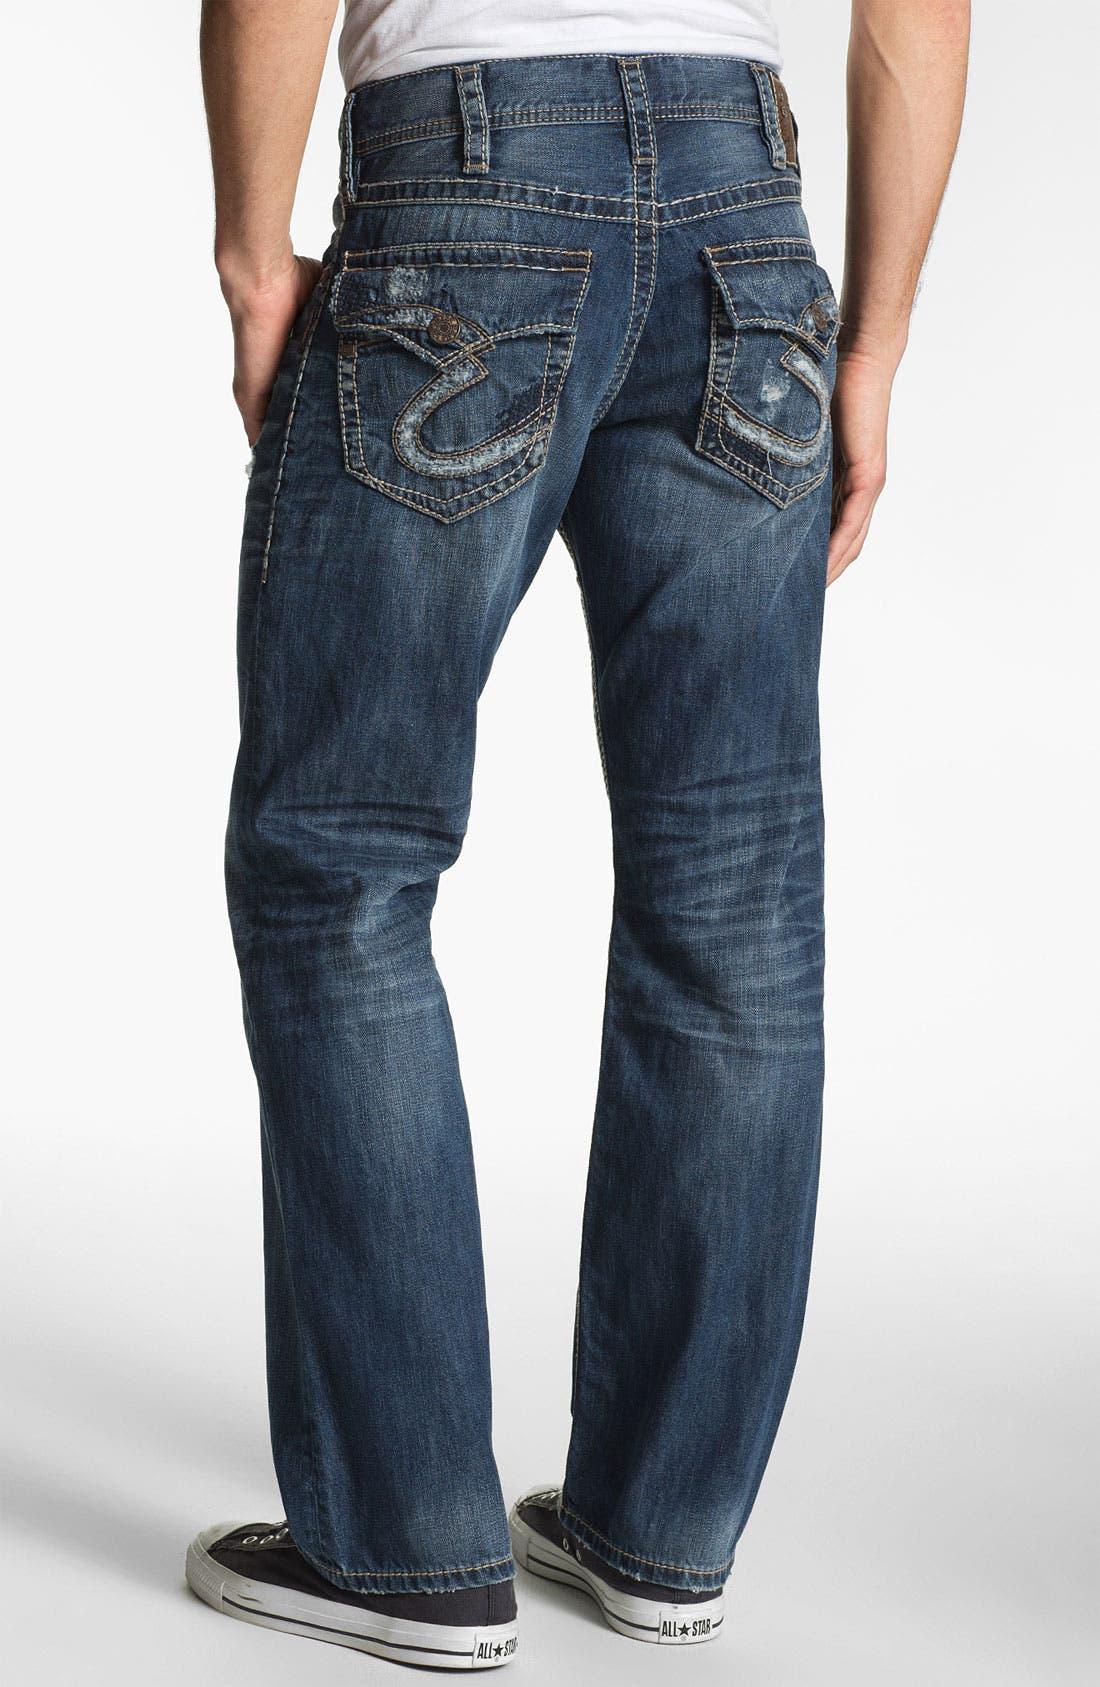 Main Image - Silver Jeans Co. 'Zac' Straight Leg Jeans (Indigo)